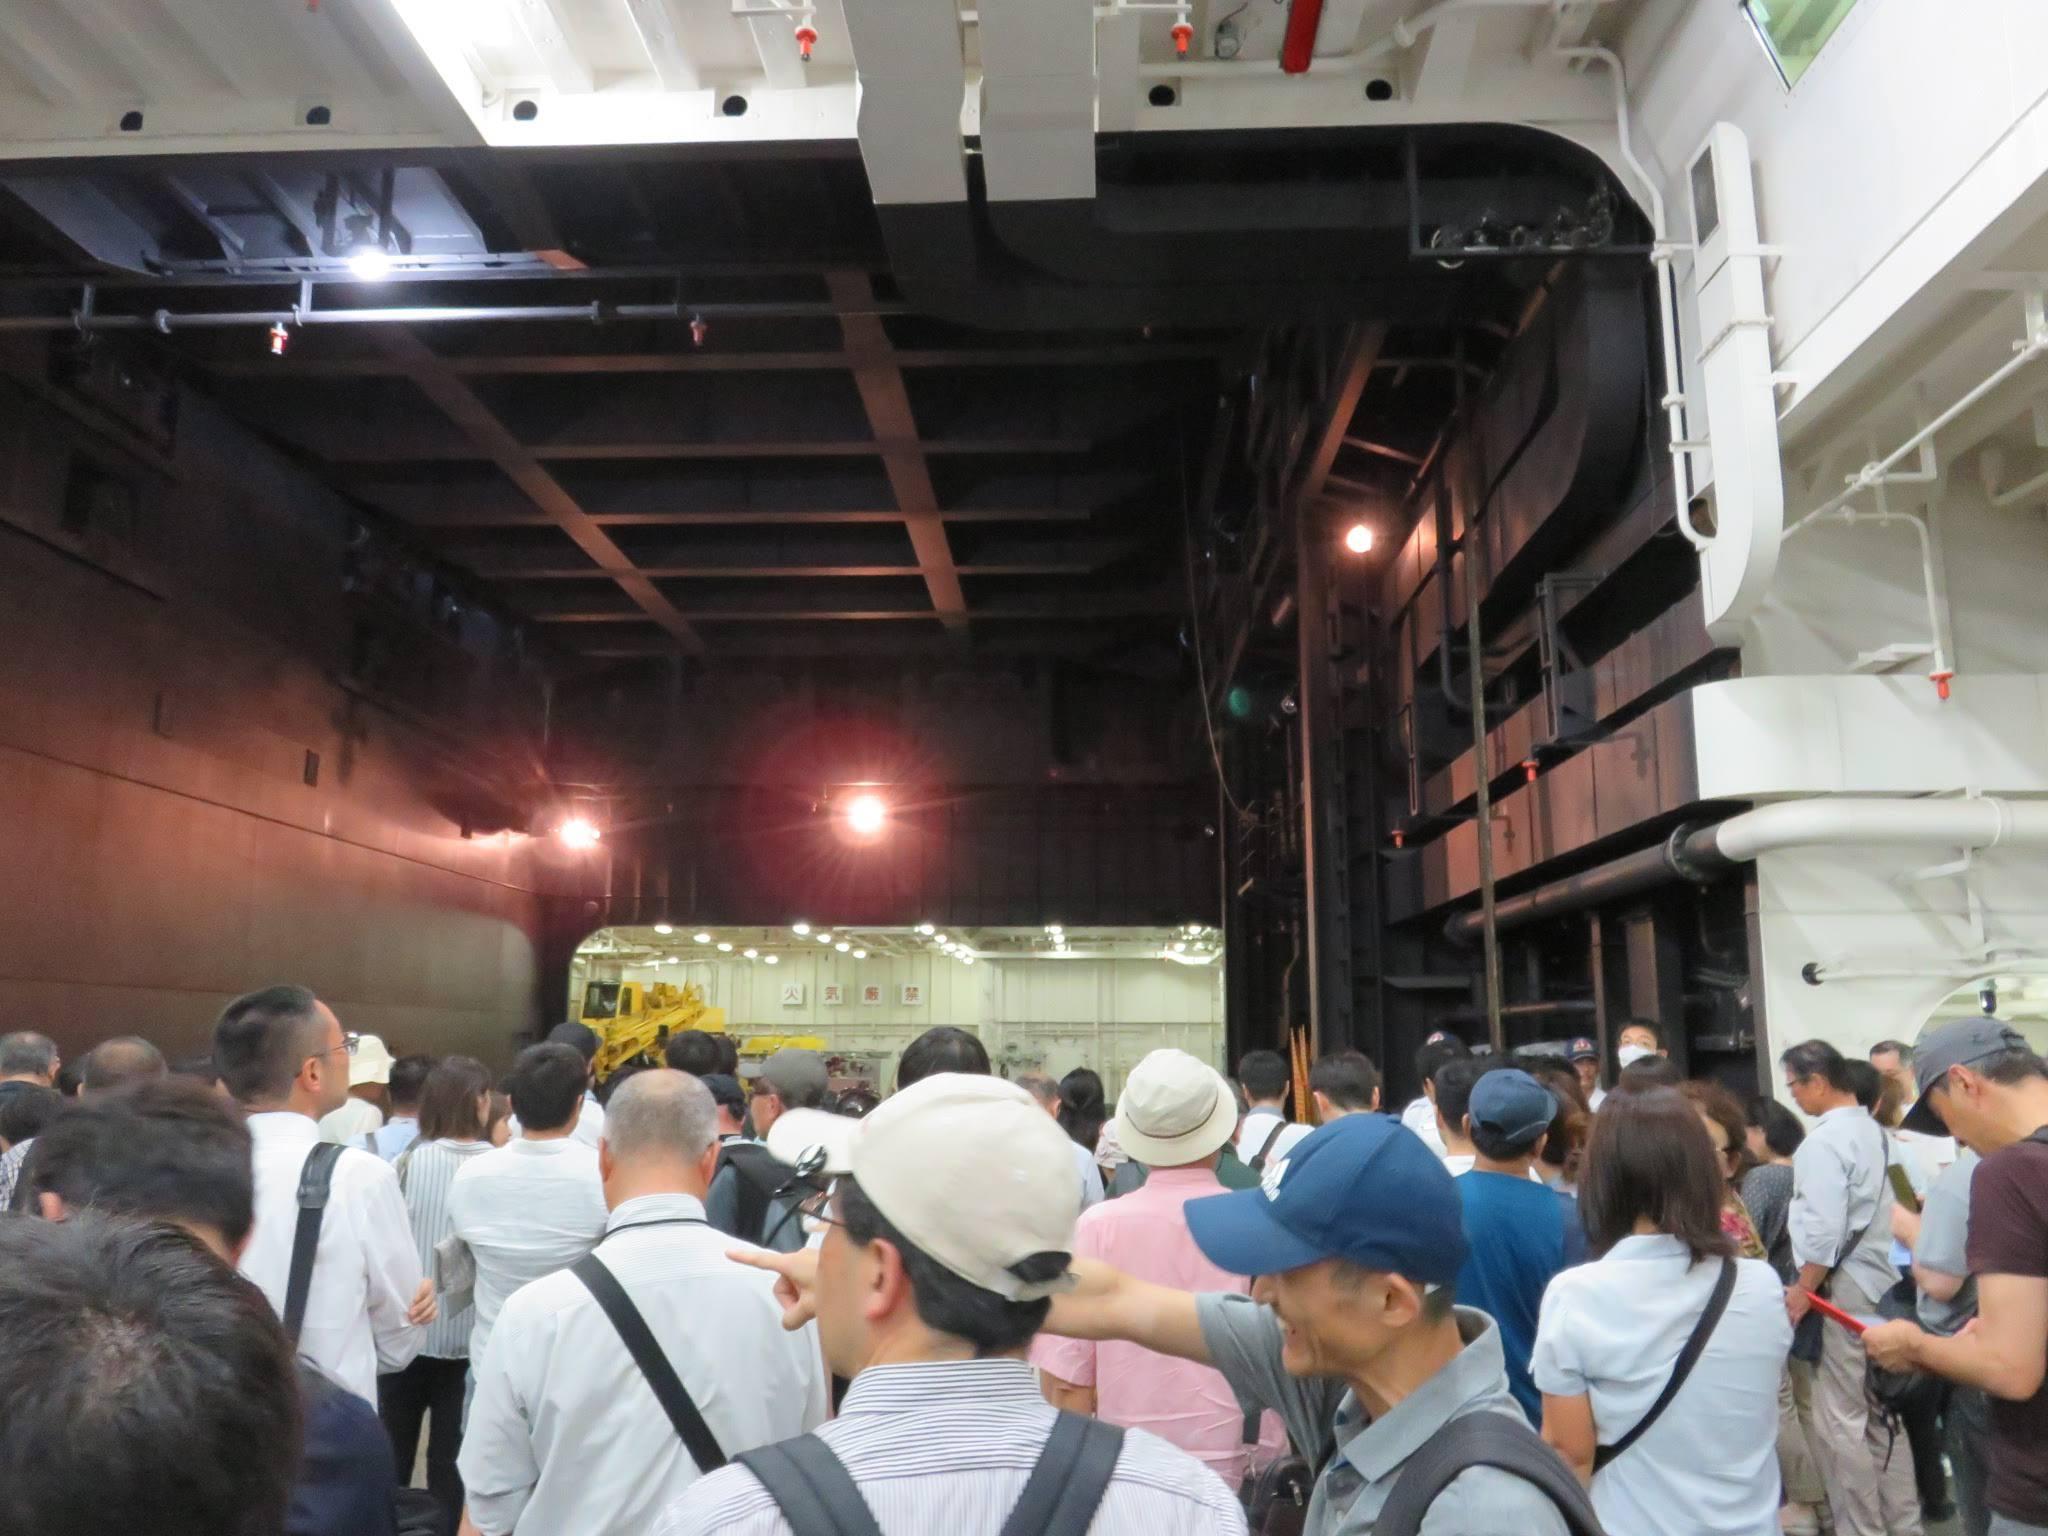 FLEETWEEK2019横浜 - 護衛艦「いずも」一般公開_a0057402_23392341.jpg